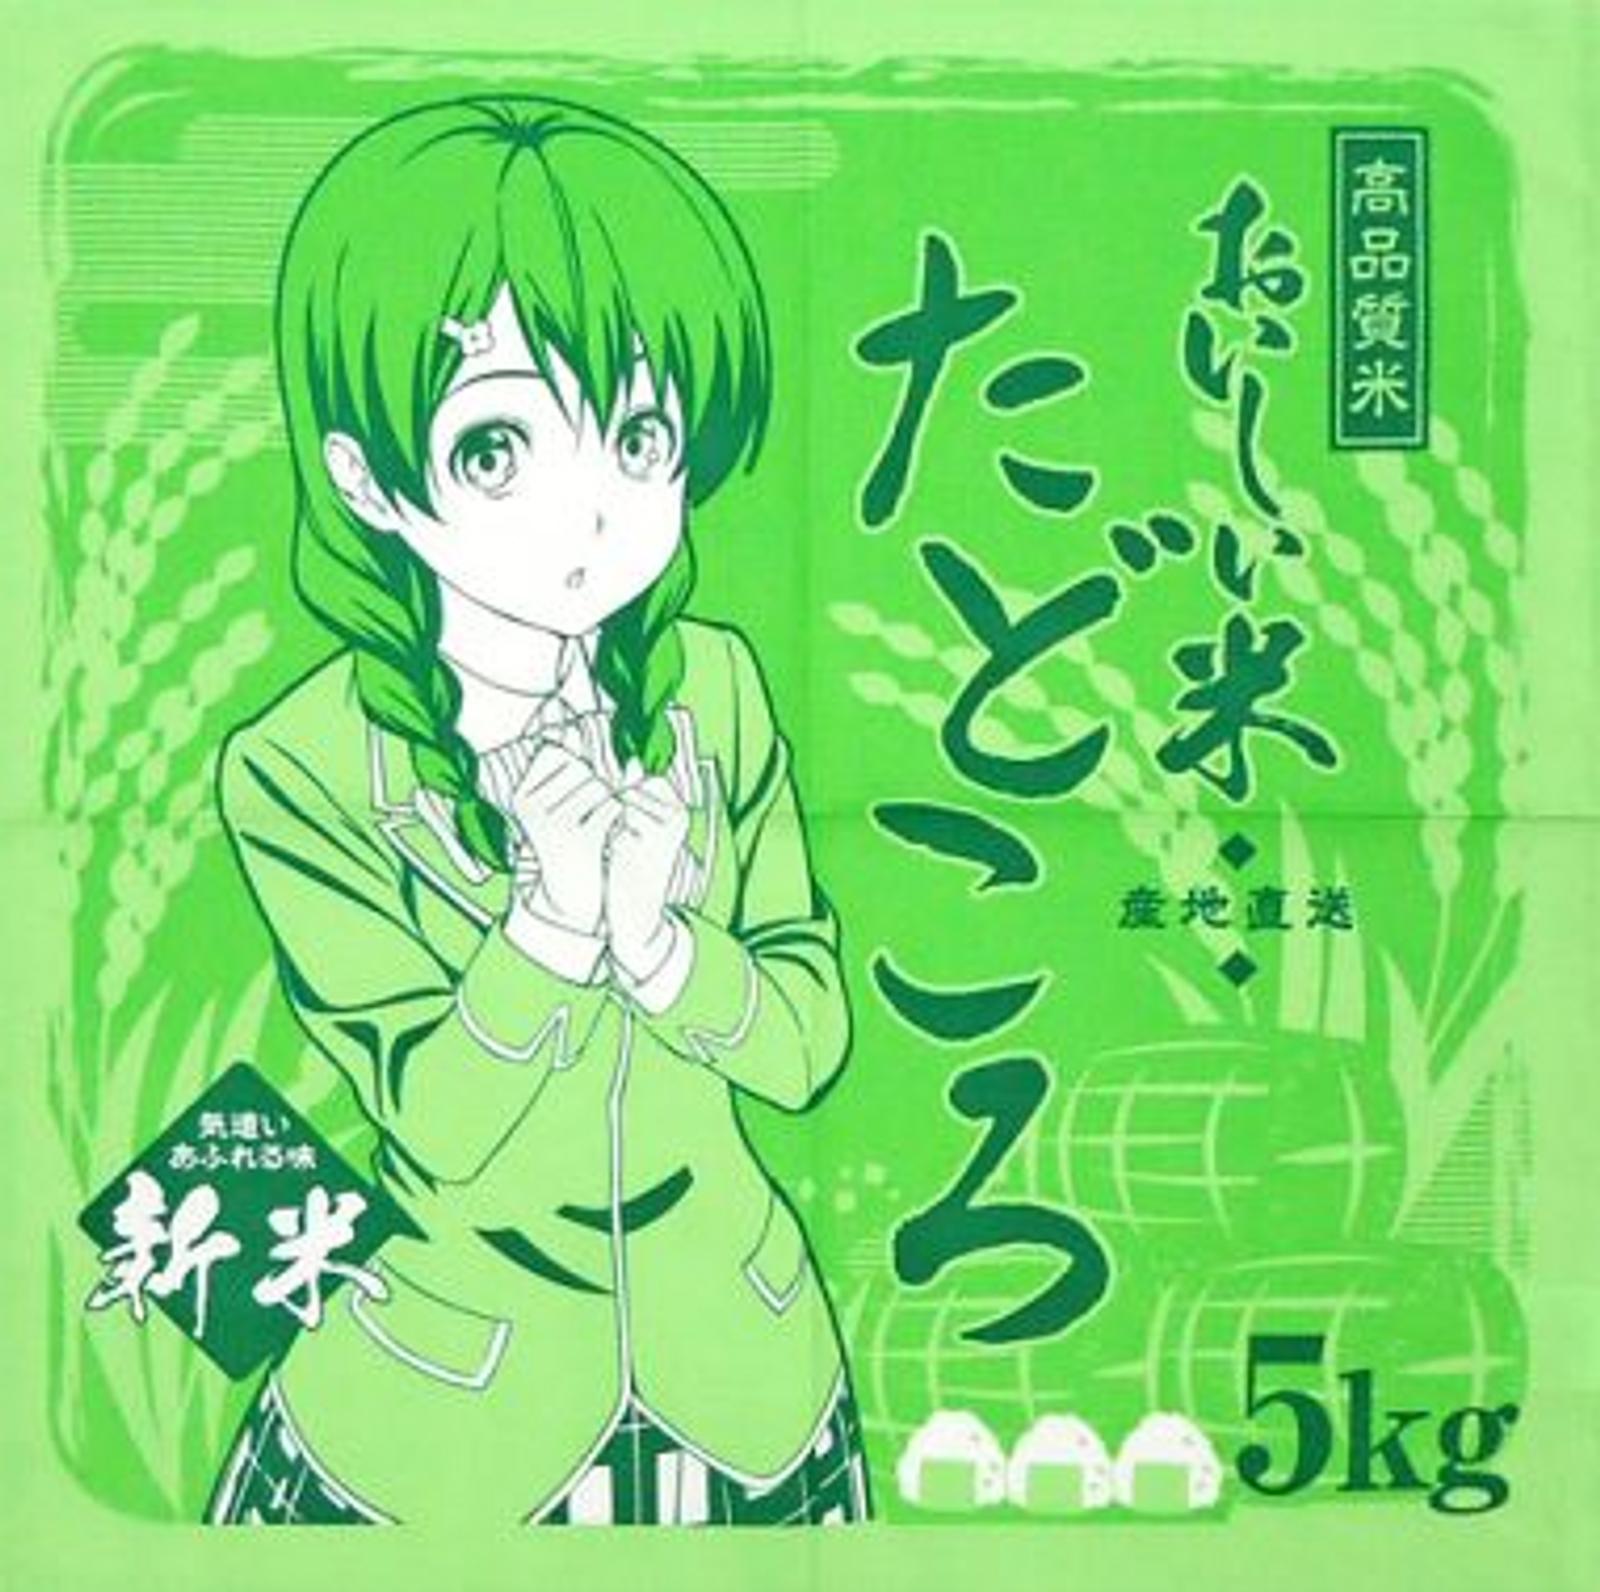 Food Wars!: Shokugeki no Soma Megumi Tadokoro Napkin 45x45cm JAPAN ANIME SHONEN JUMP